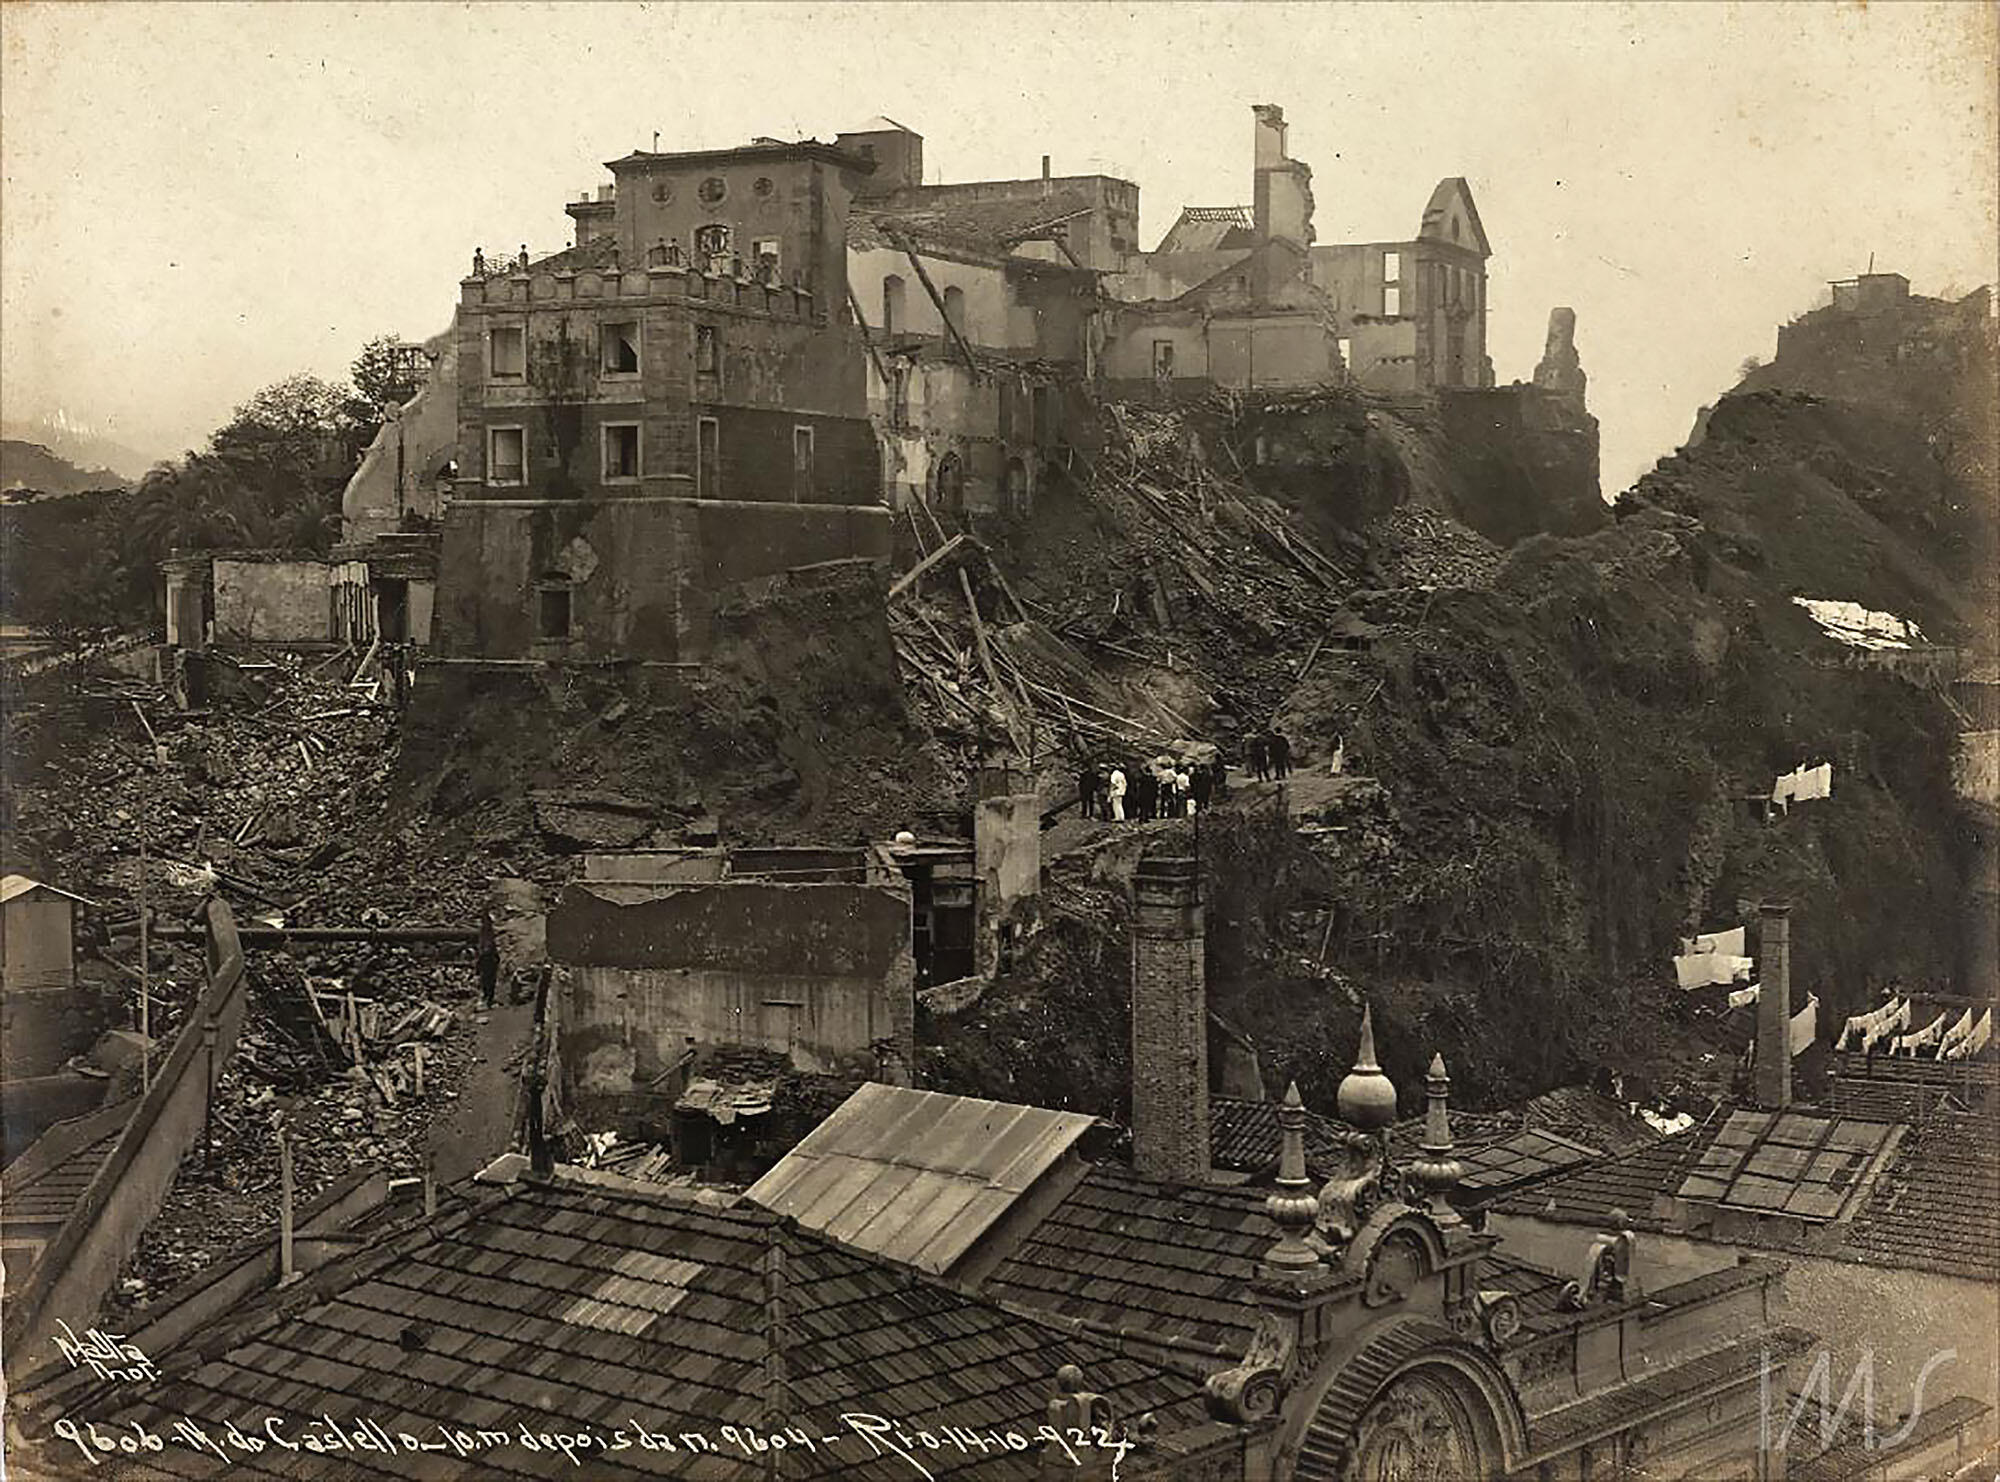 Ruined buildings cascade down the hillside during the destruction of the Morro de Castelo in Rio de Janeiro. (Photo courtesy of Instituto Moreira Salles.)